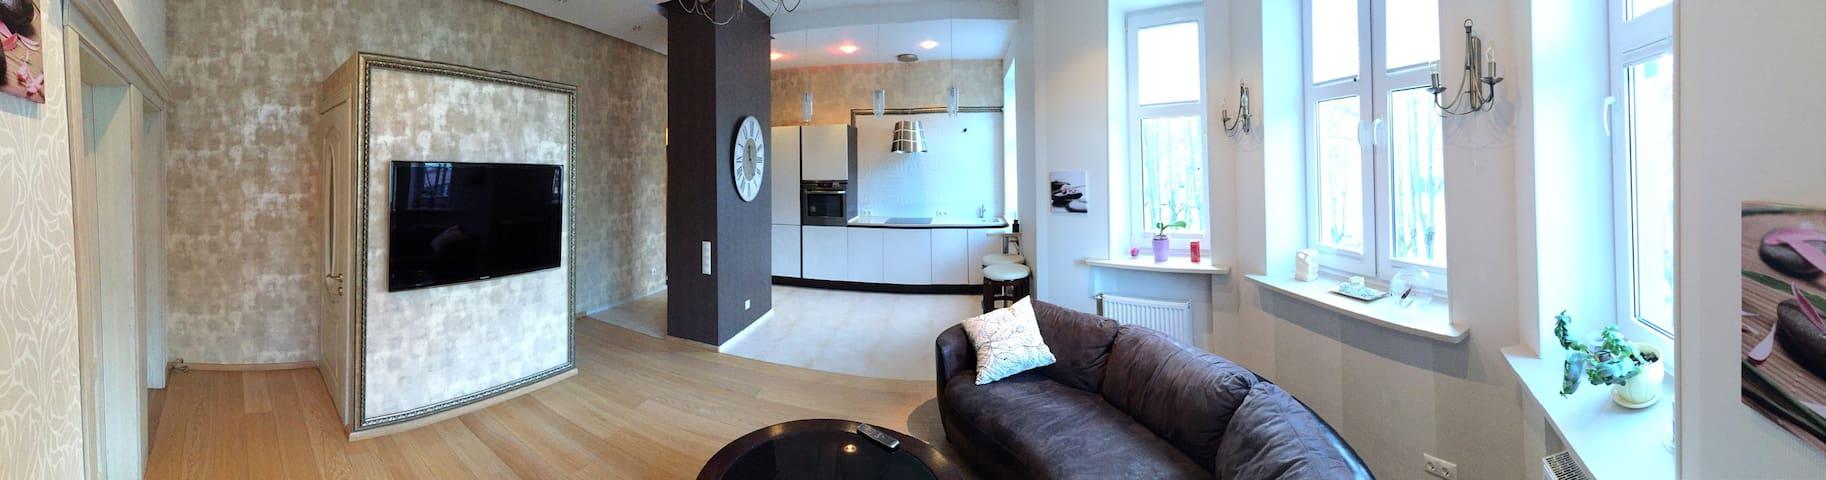 Neries Apartments - Klaipėda - Apartemen